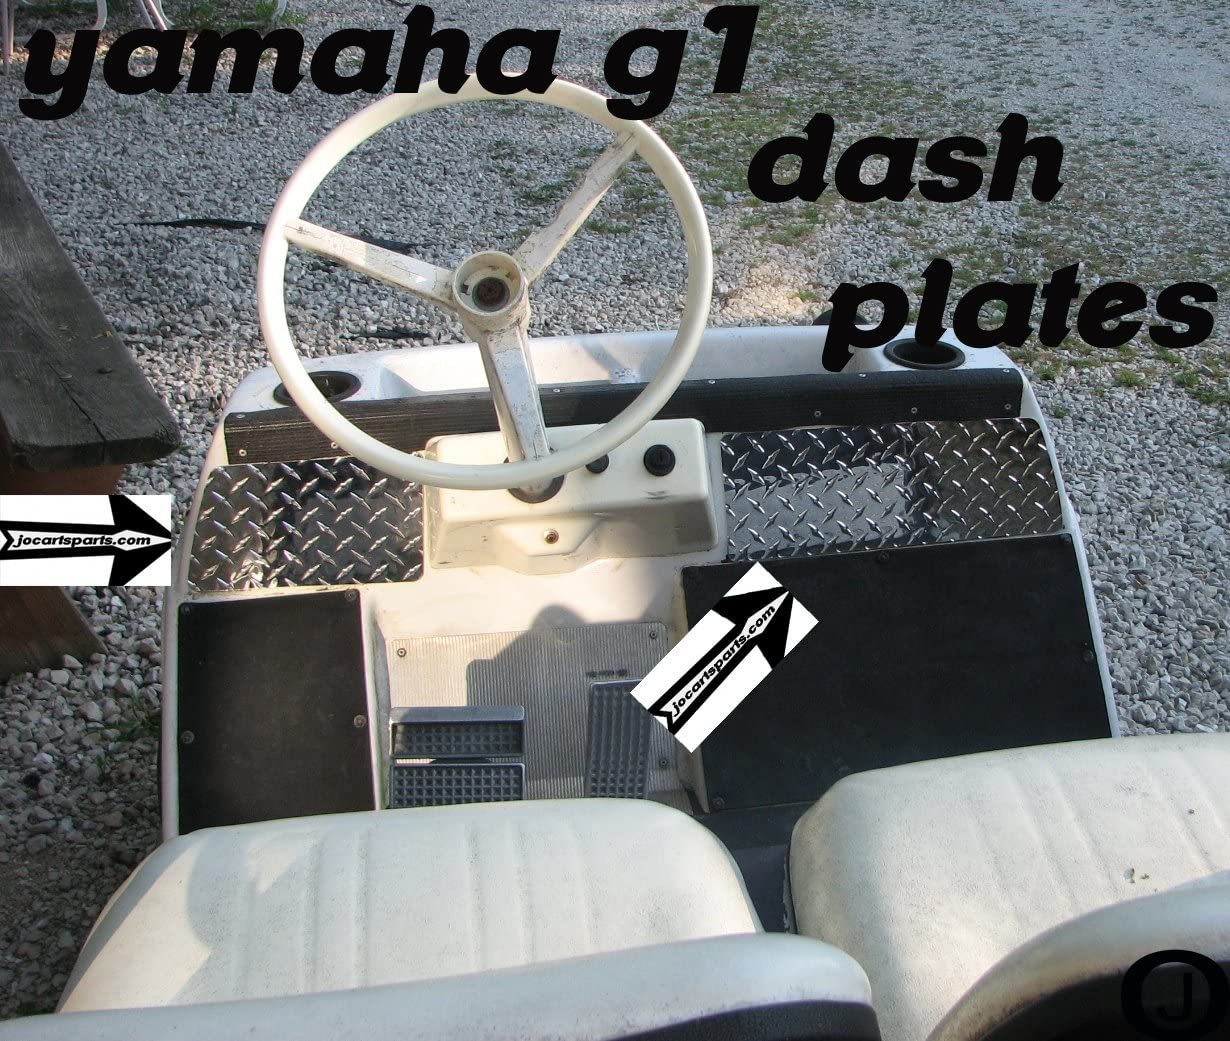 Yamaha G1 Golf Cart Diamond Plate Dash Plates